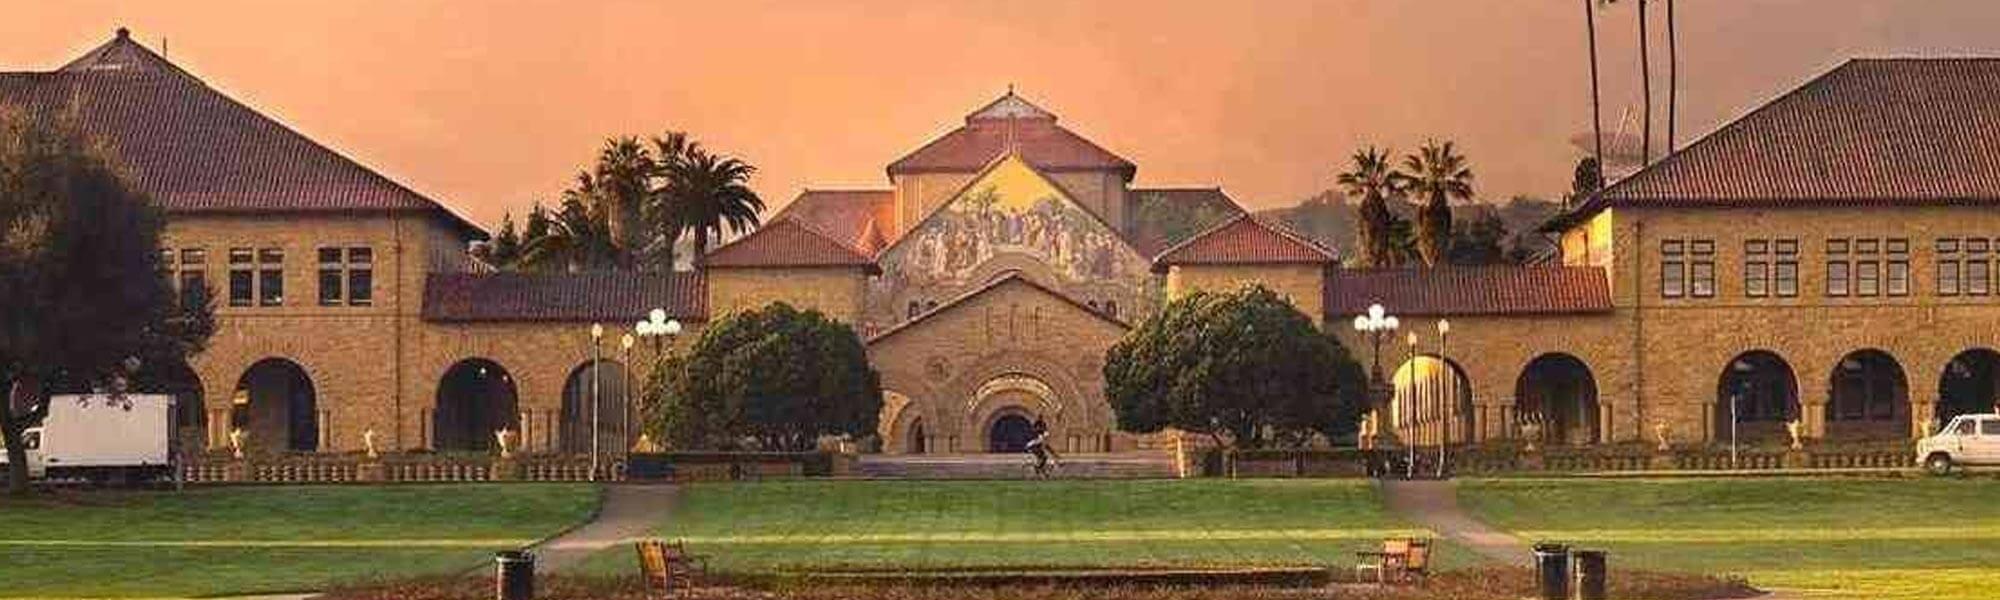 Stanford mba essay help